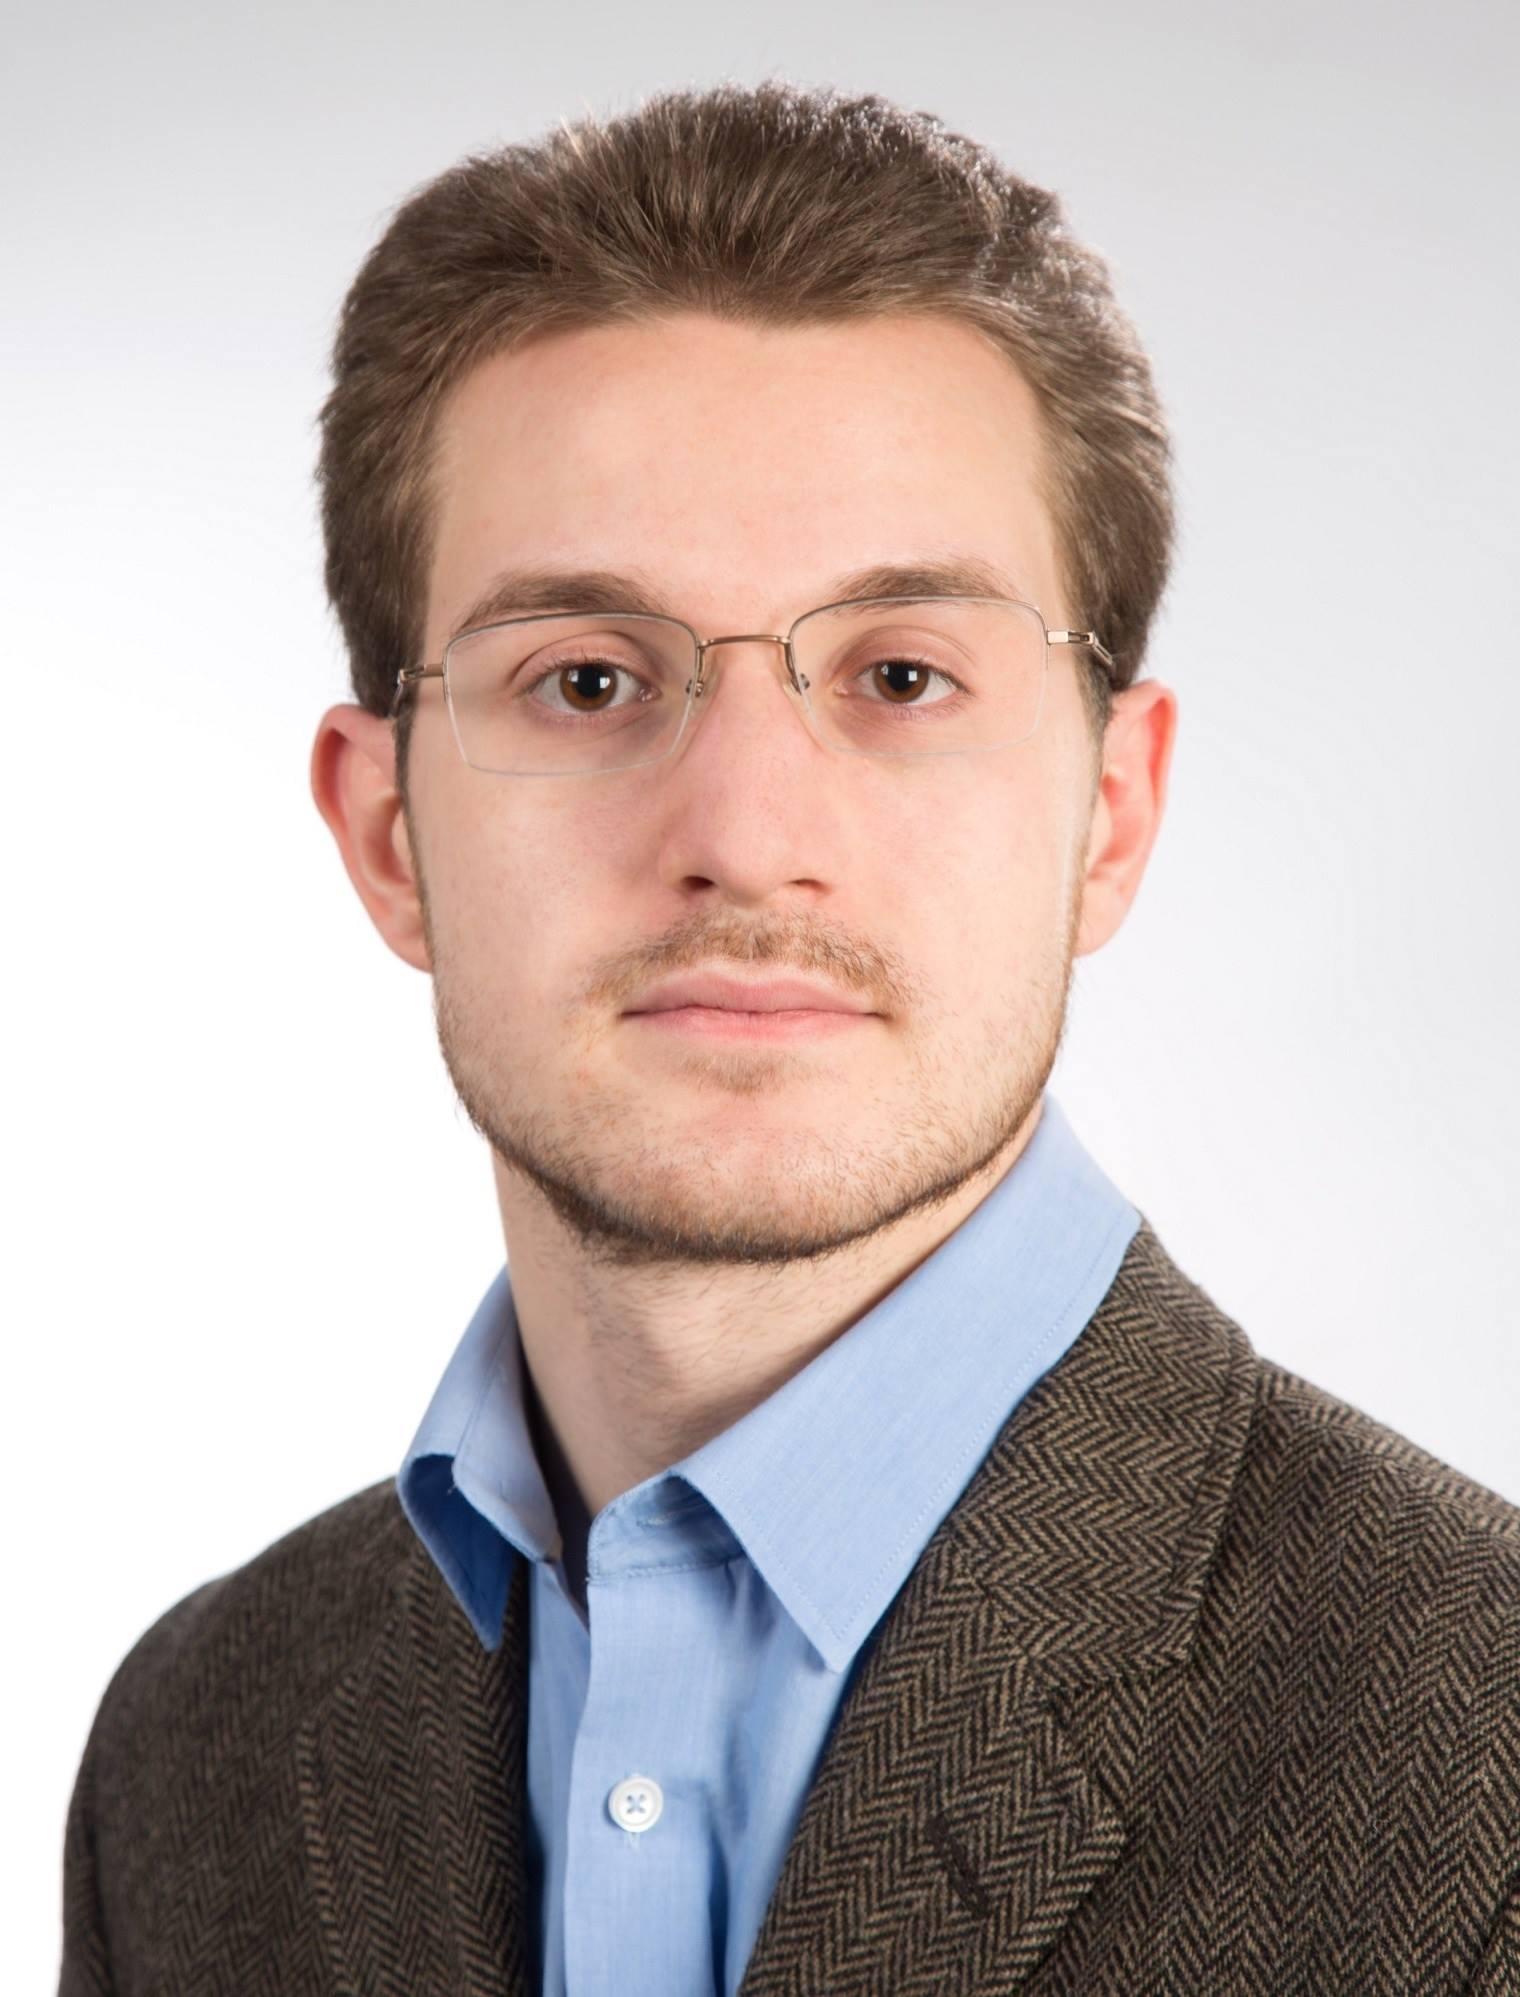 Edoardo Cappelletti